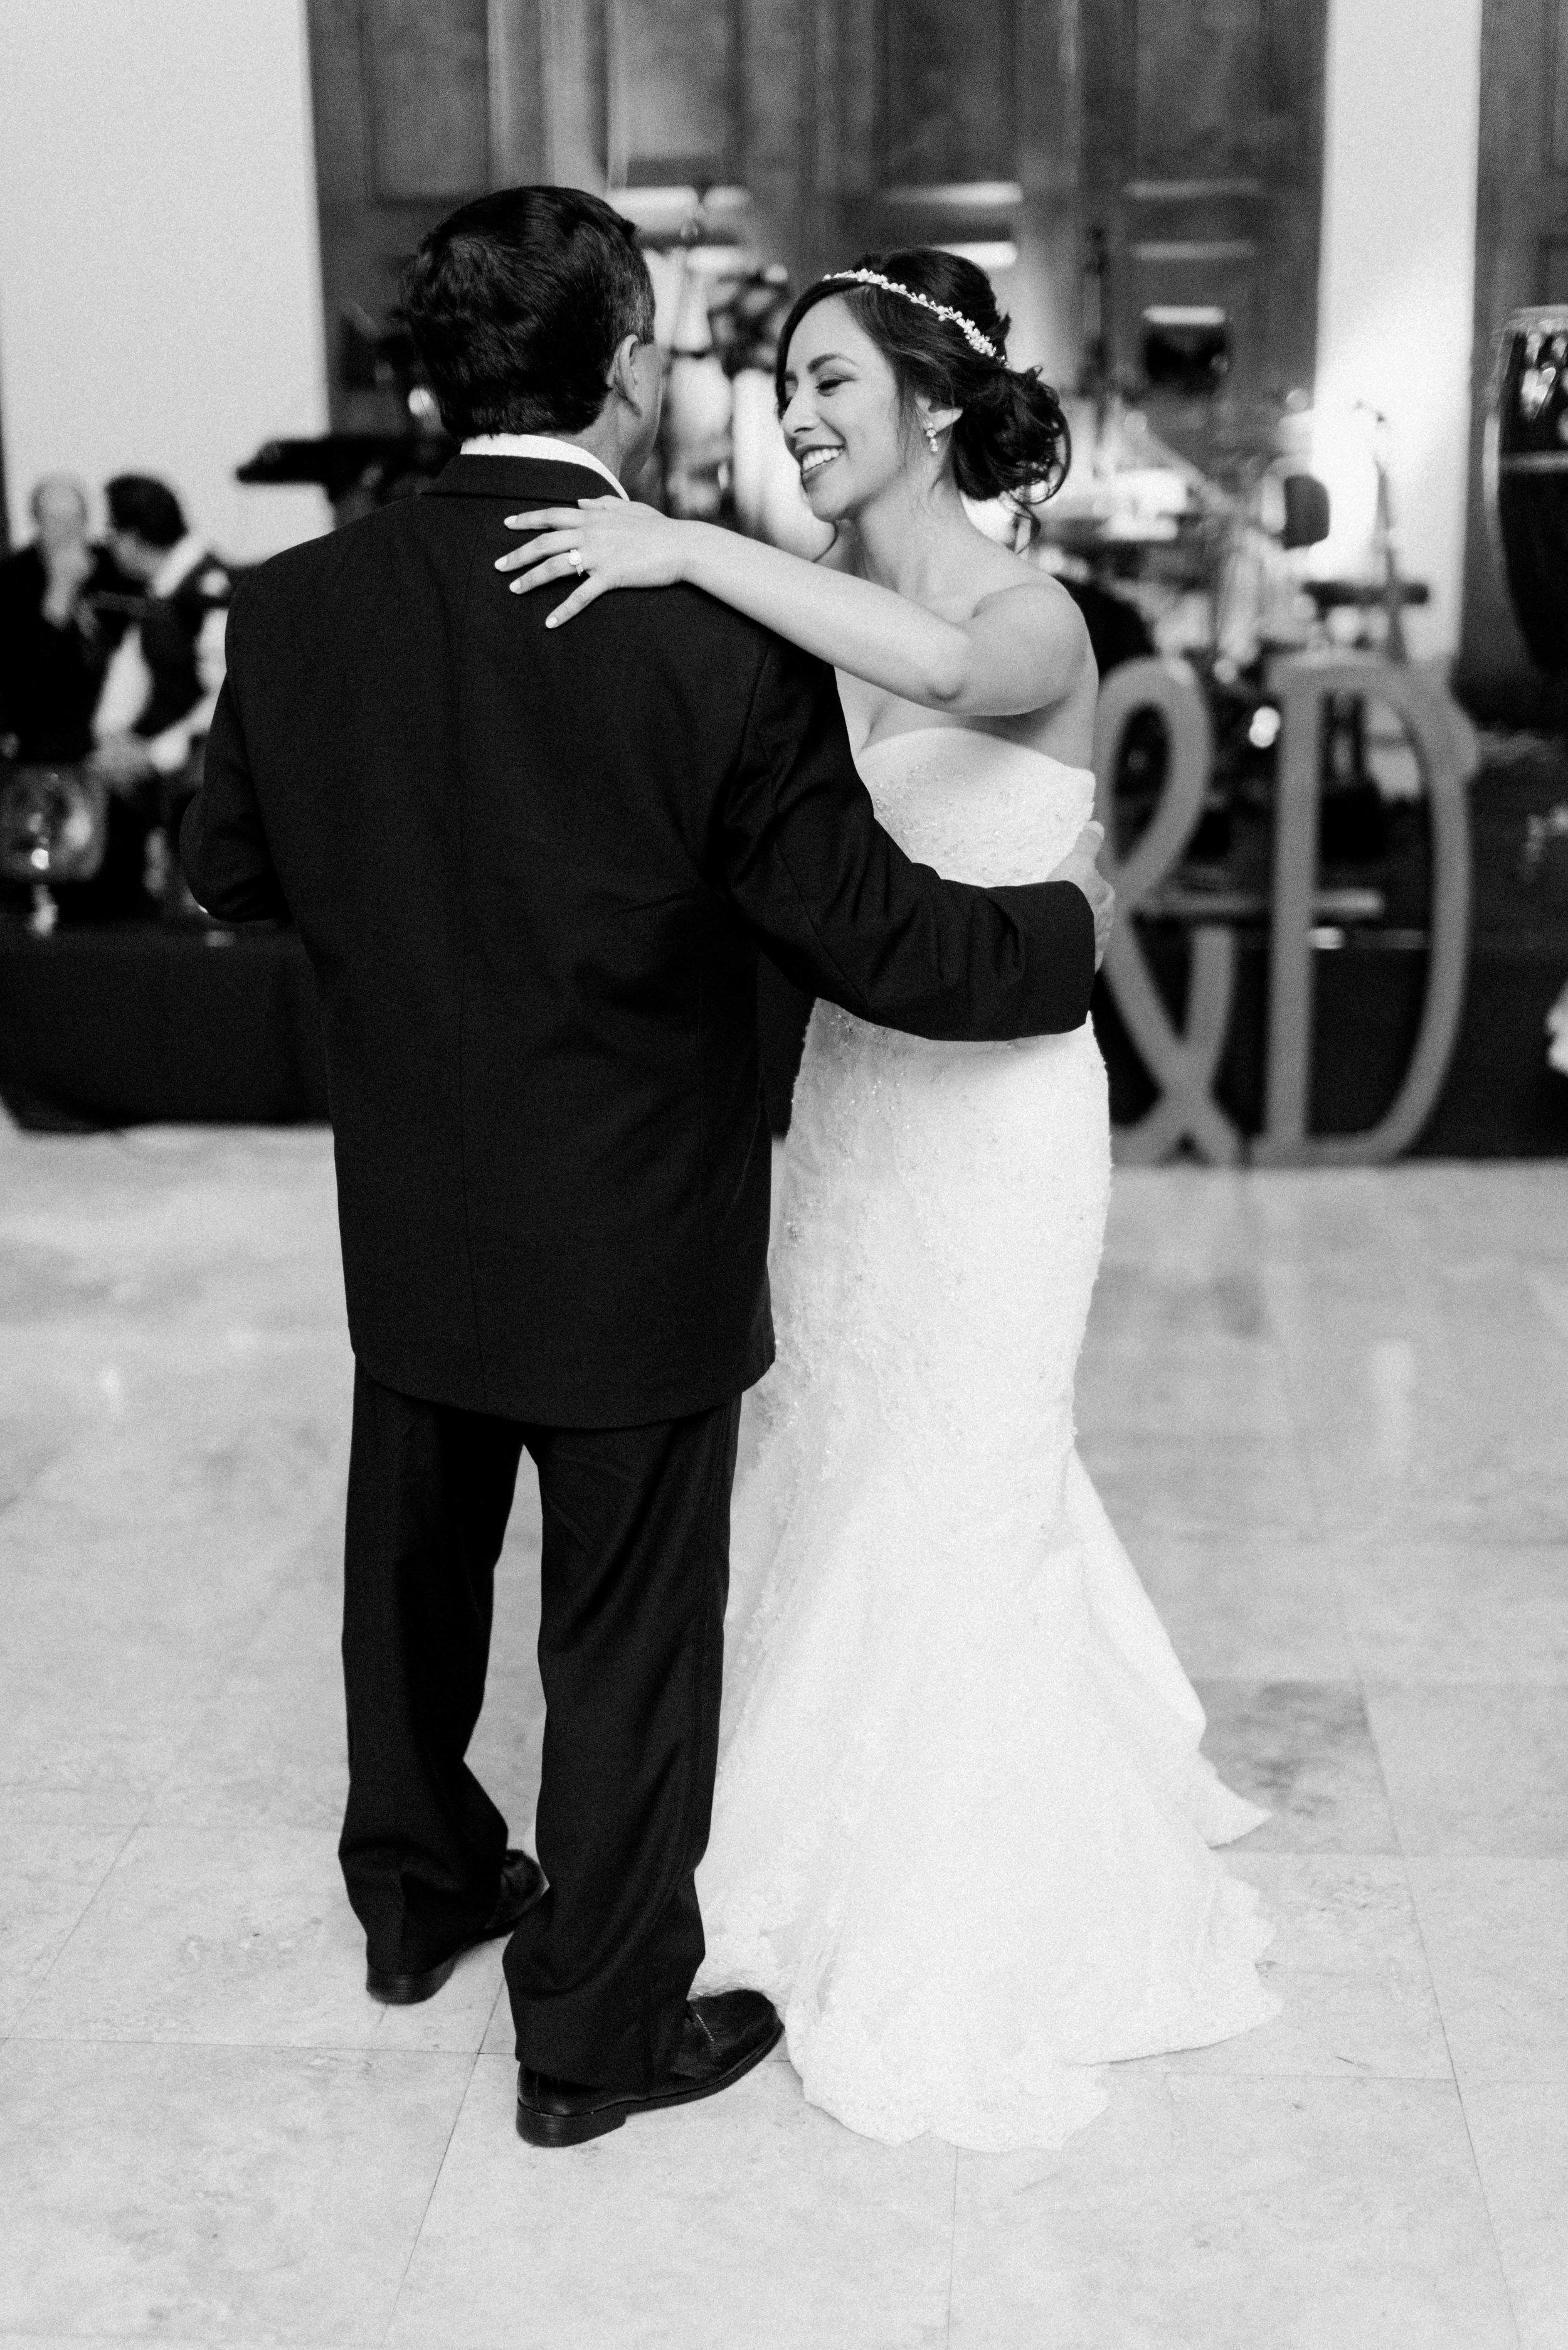 Houston-Wedding-Photography-St.-Anne-Catholic-Church-Houston-Wedding-The-Bell-Tower-on-34th-reception-wedding-film-36.jpg